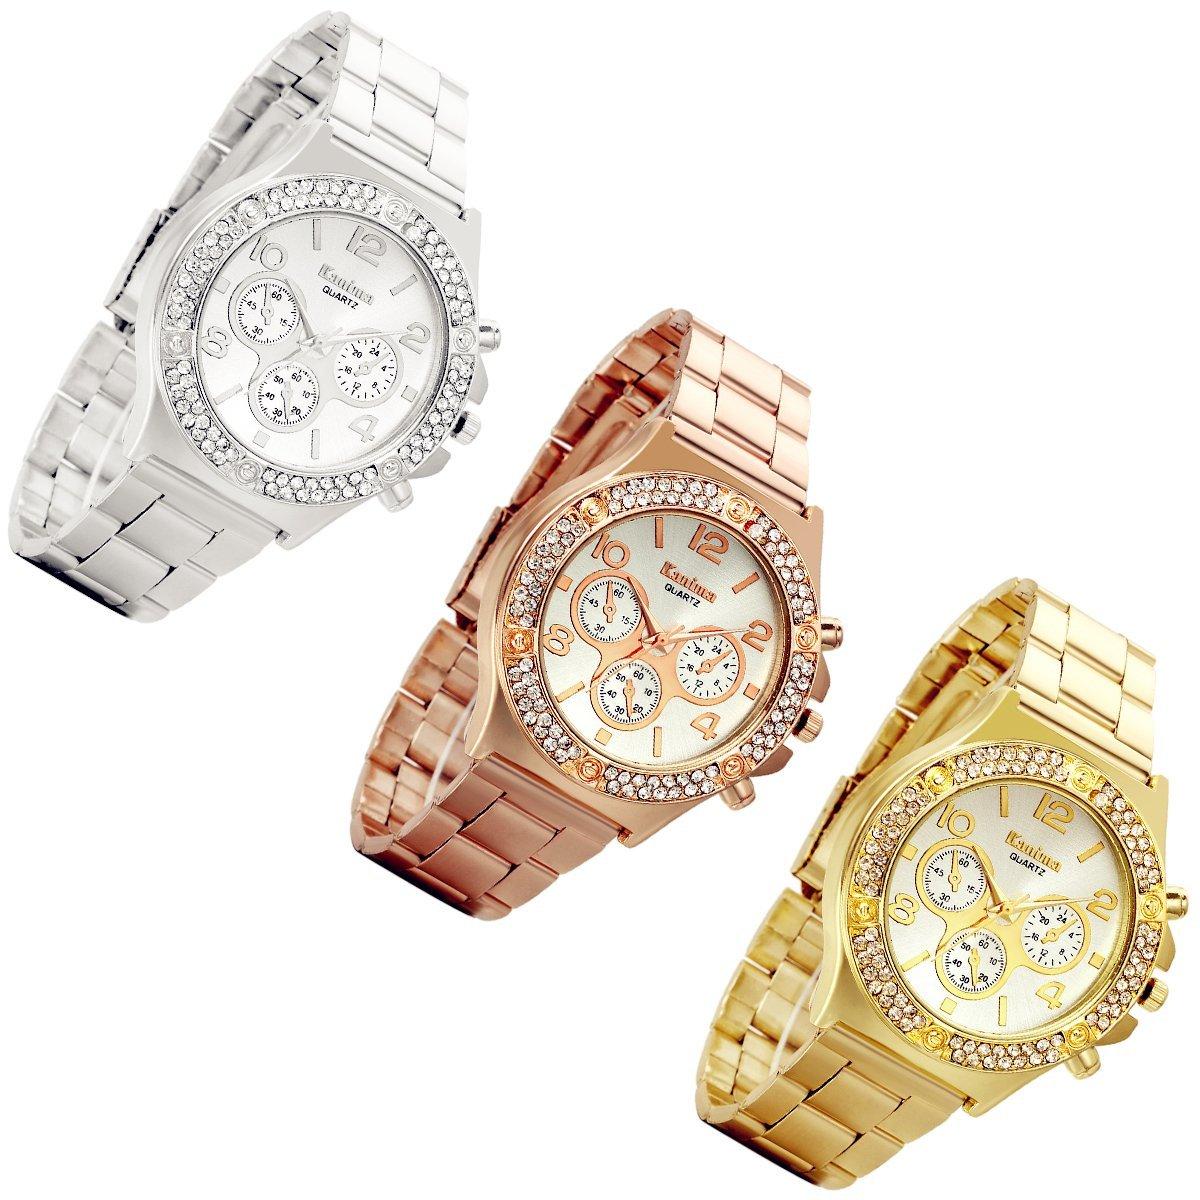 Men's Luxury Bling Double Dual Rhinestone Bezel Japan Quartz 30M Waterproof Gold Tone Bracelet Cuff Bangle Dress Unisex Watch (Gold) by Lancardo (Image #4)